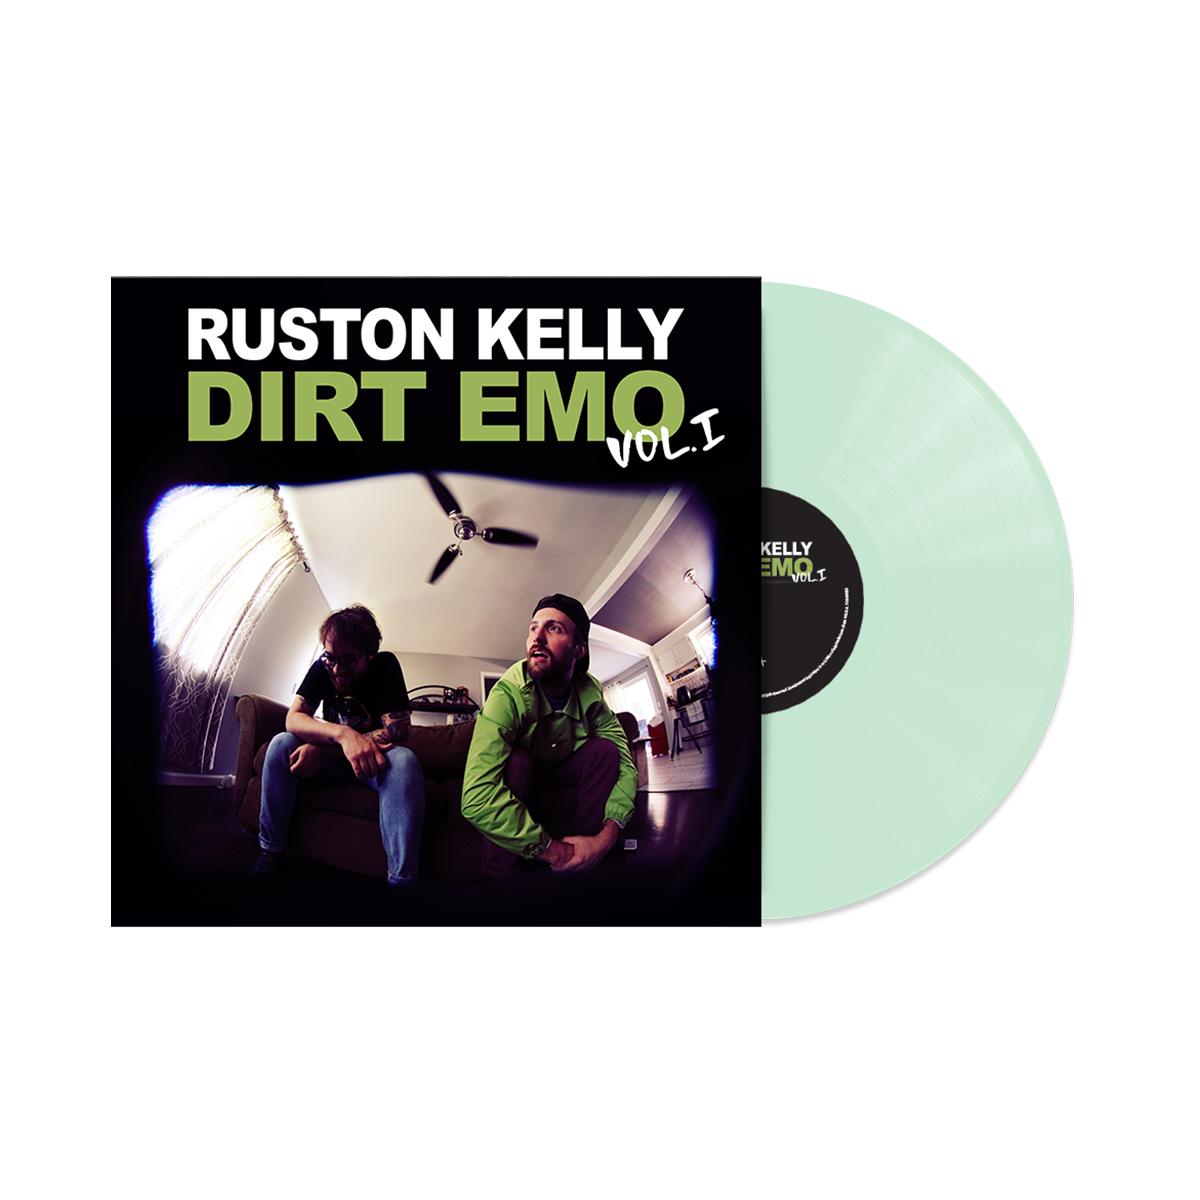 Signed Dirt Emo Vol. 1 Glow-in-the-dark Vinyl Supreme Bundle